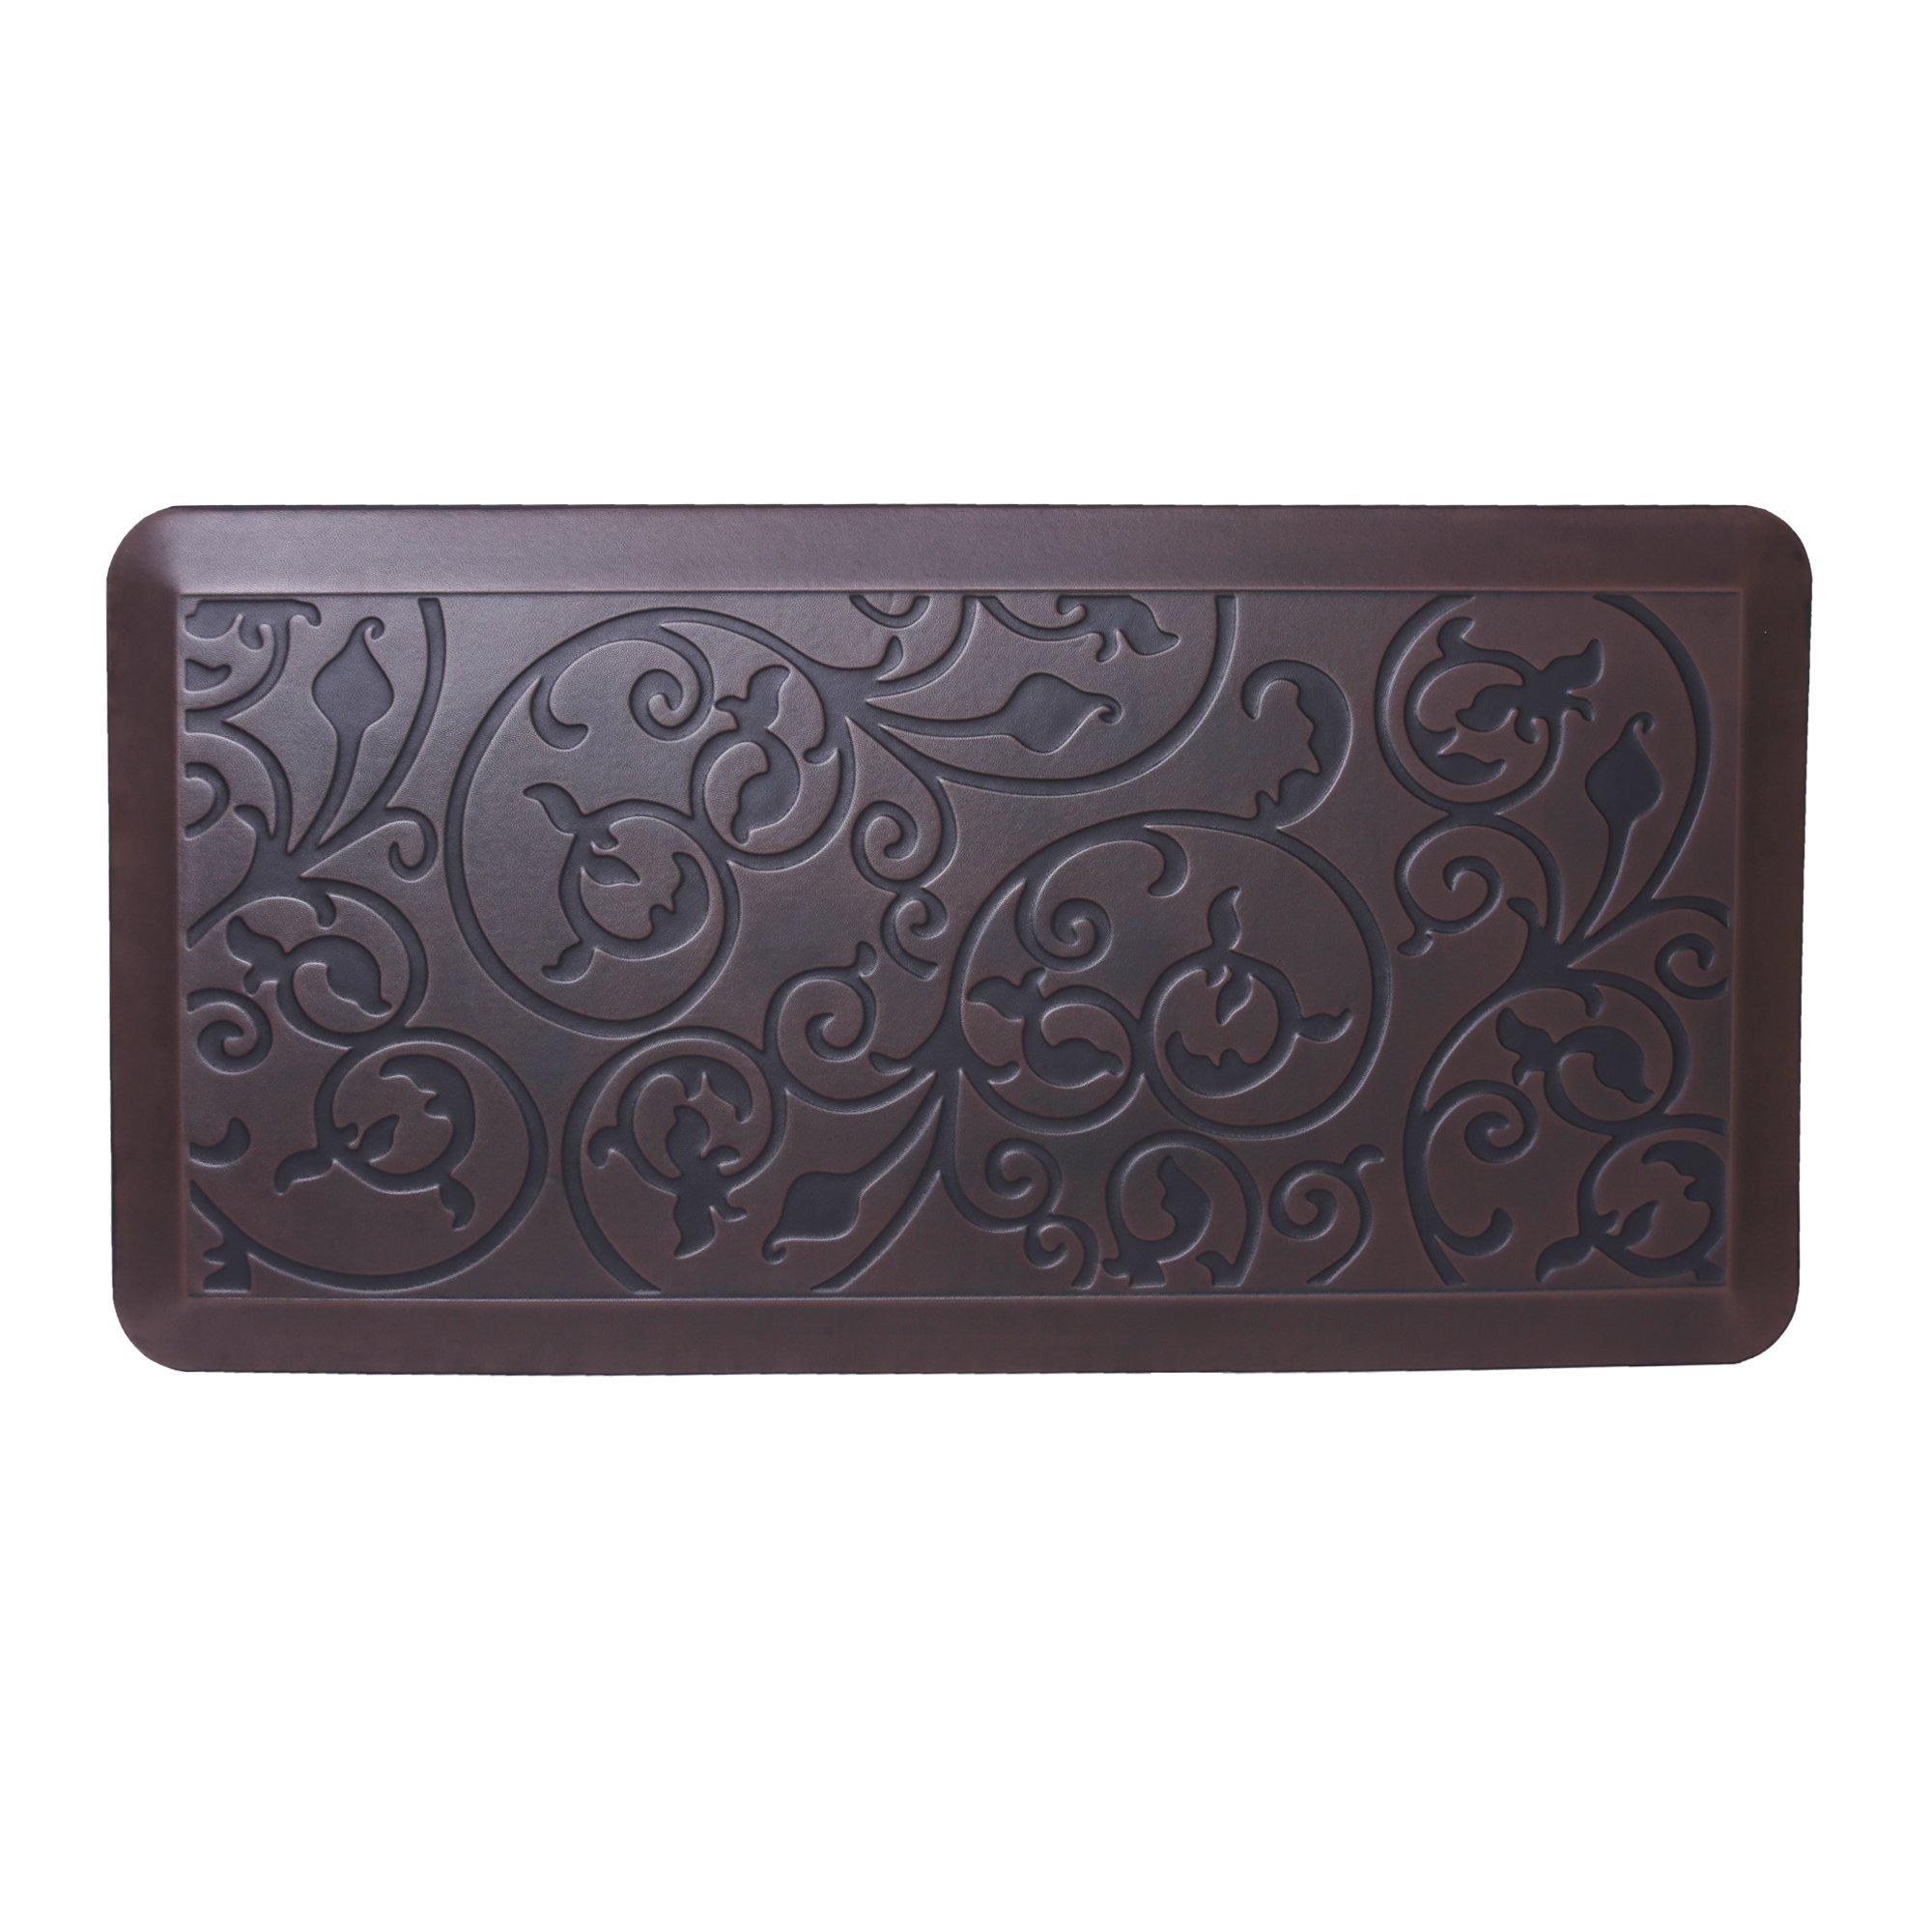 AMCOMFY Kitchen Anti Fatigue Mat,Comfort Floor Mats,Standing Desk Mats,Antique Series (20''x39''x3/4'', Antique Dark)